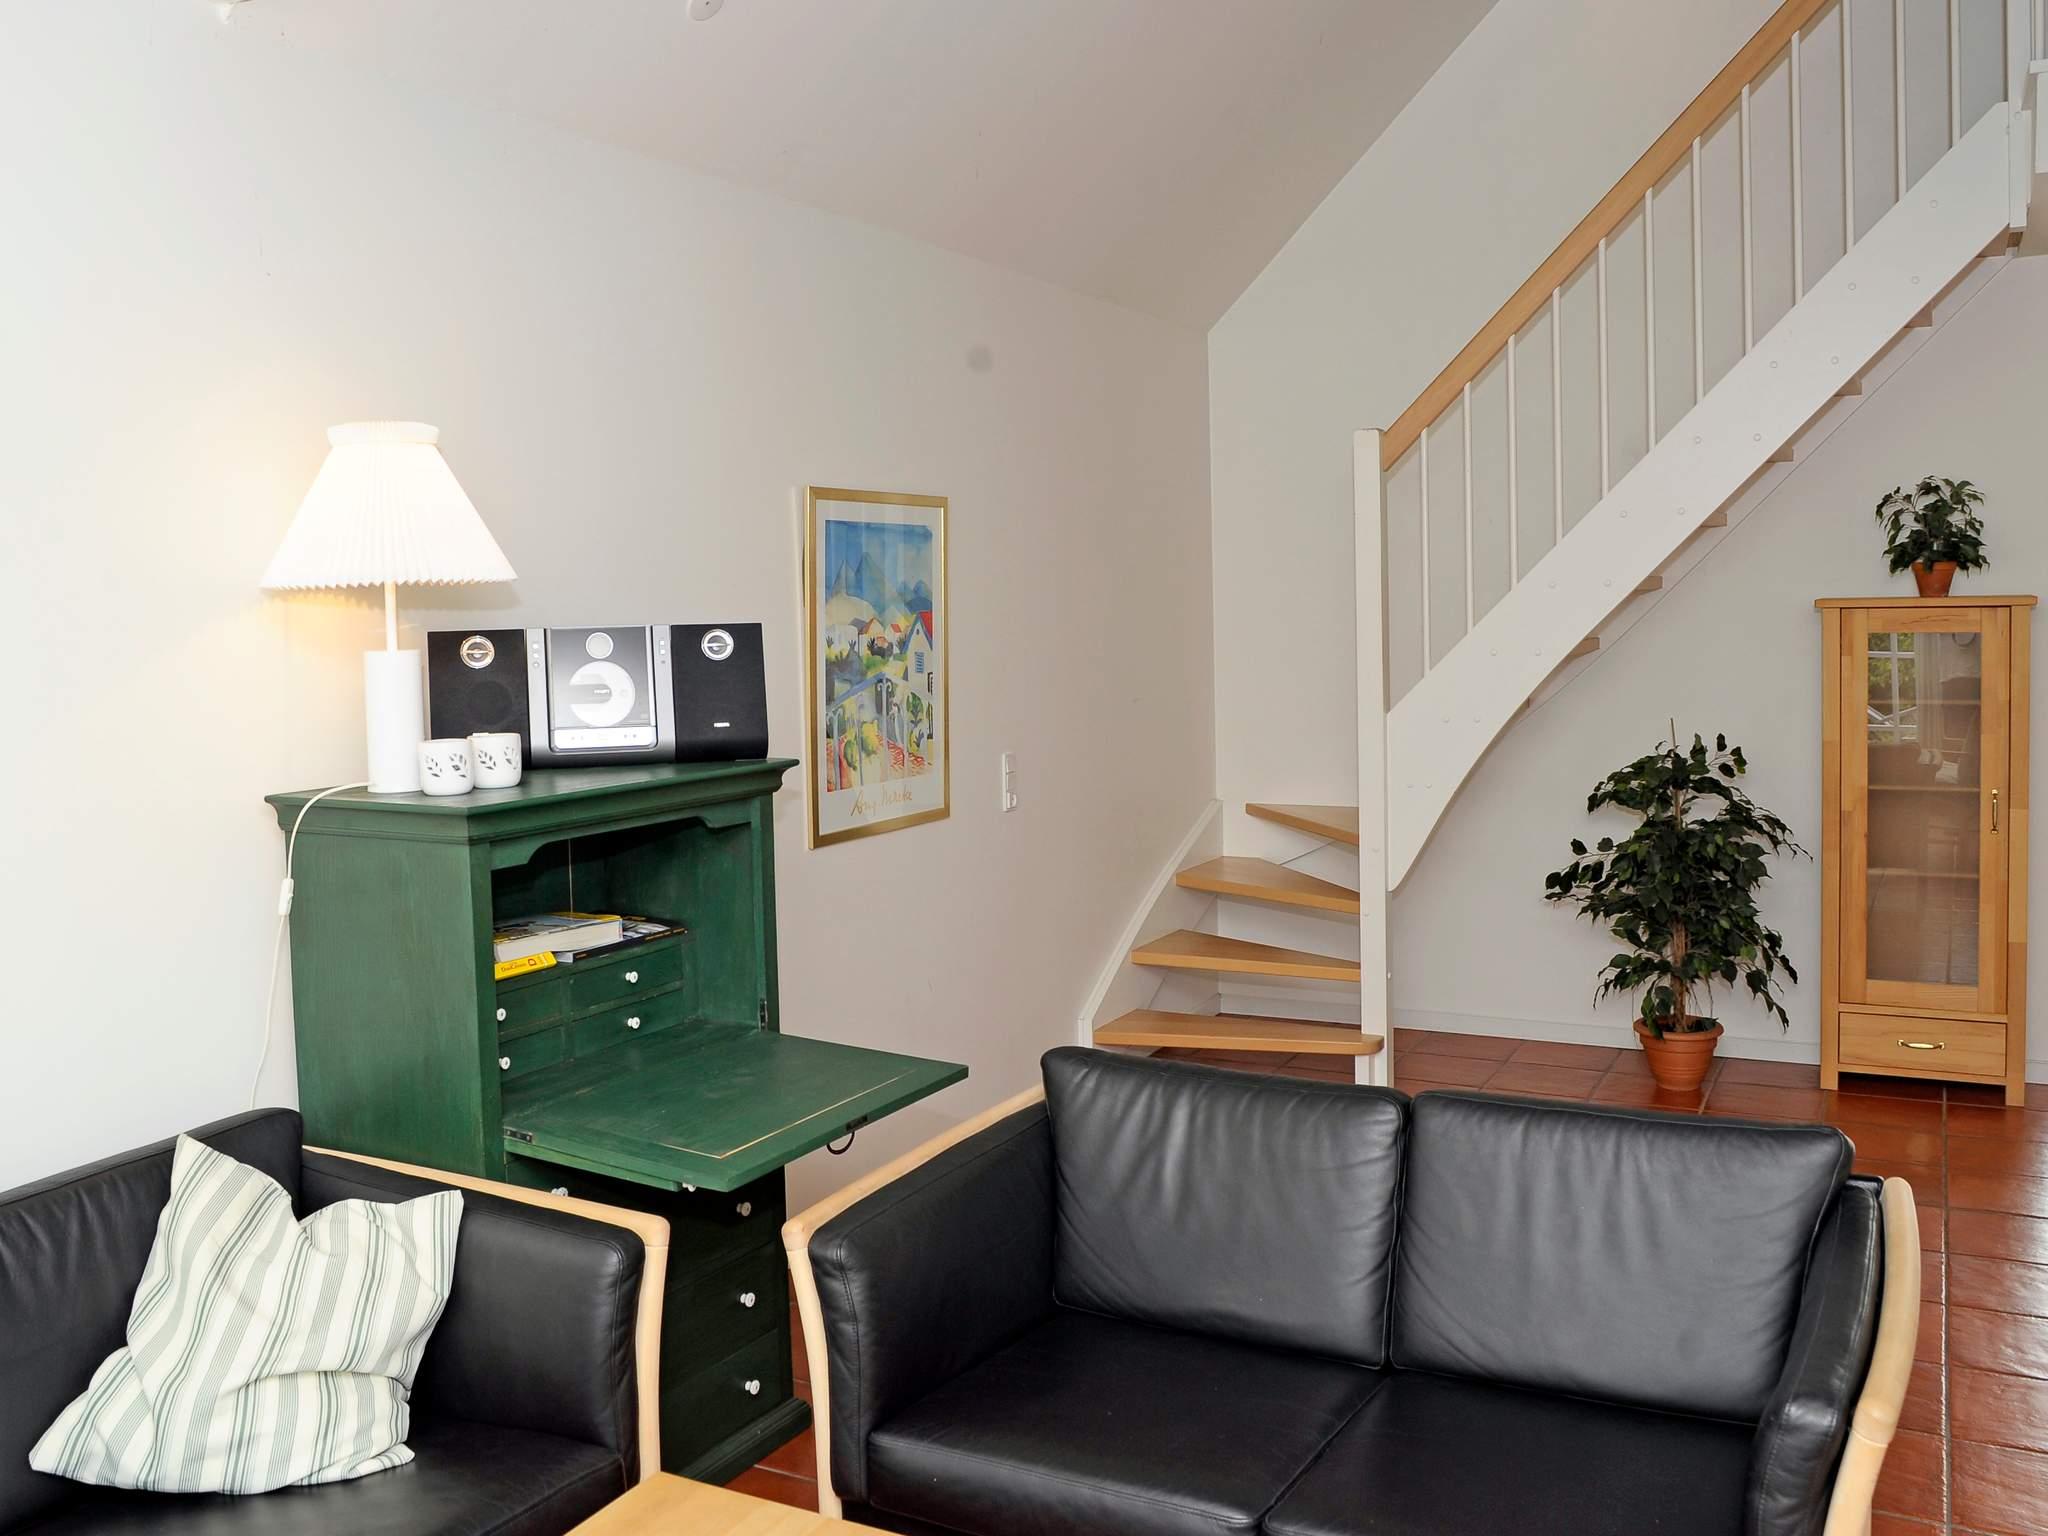 Ferienhaus Blåvand (224791), Blåvand, , Westjütland, Dänemark, Bild 5